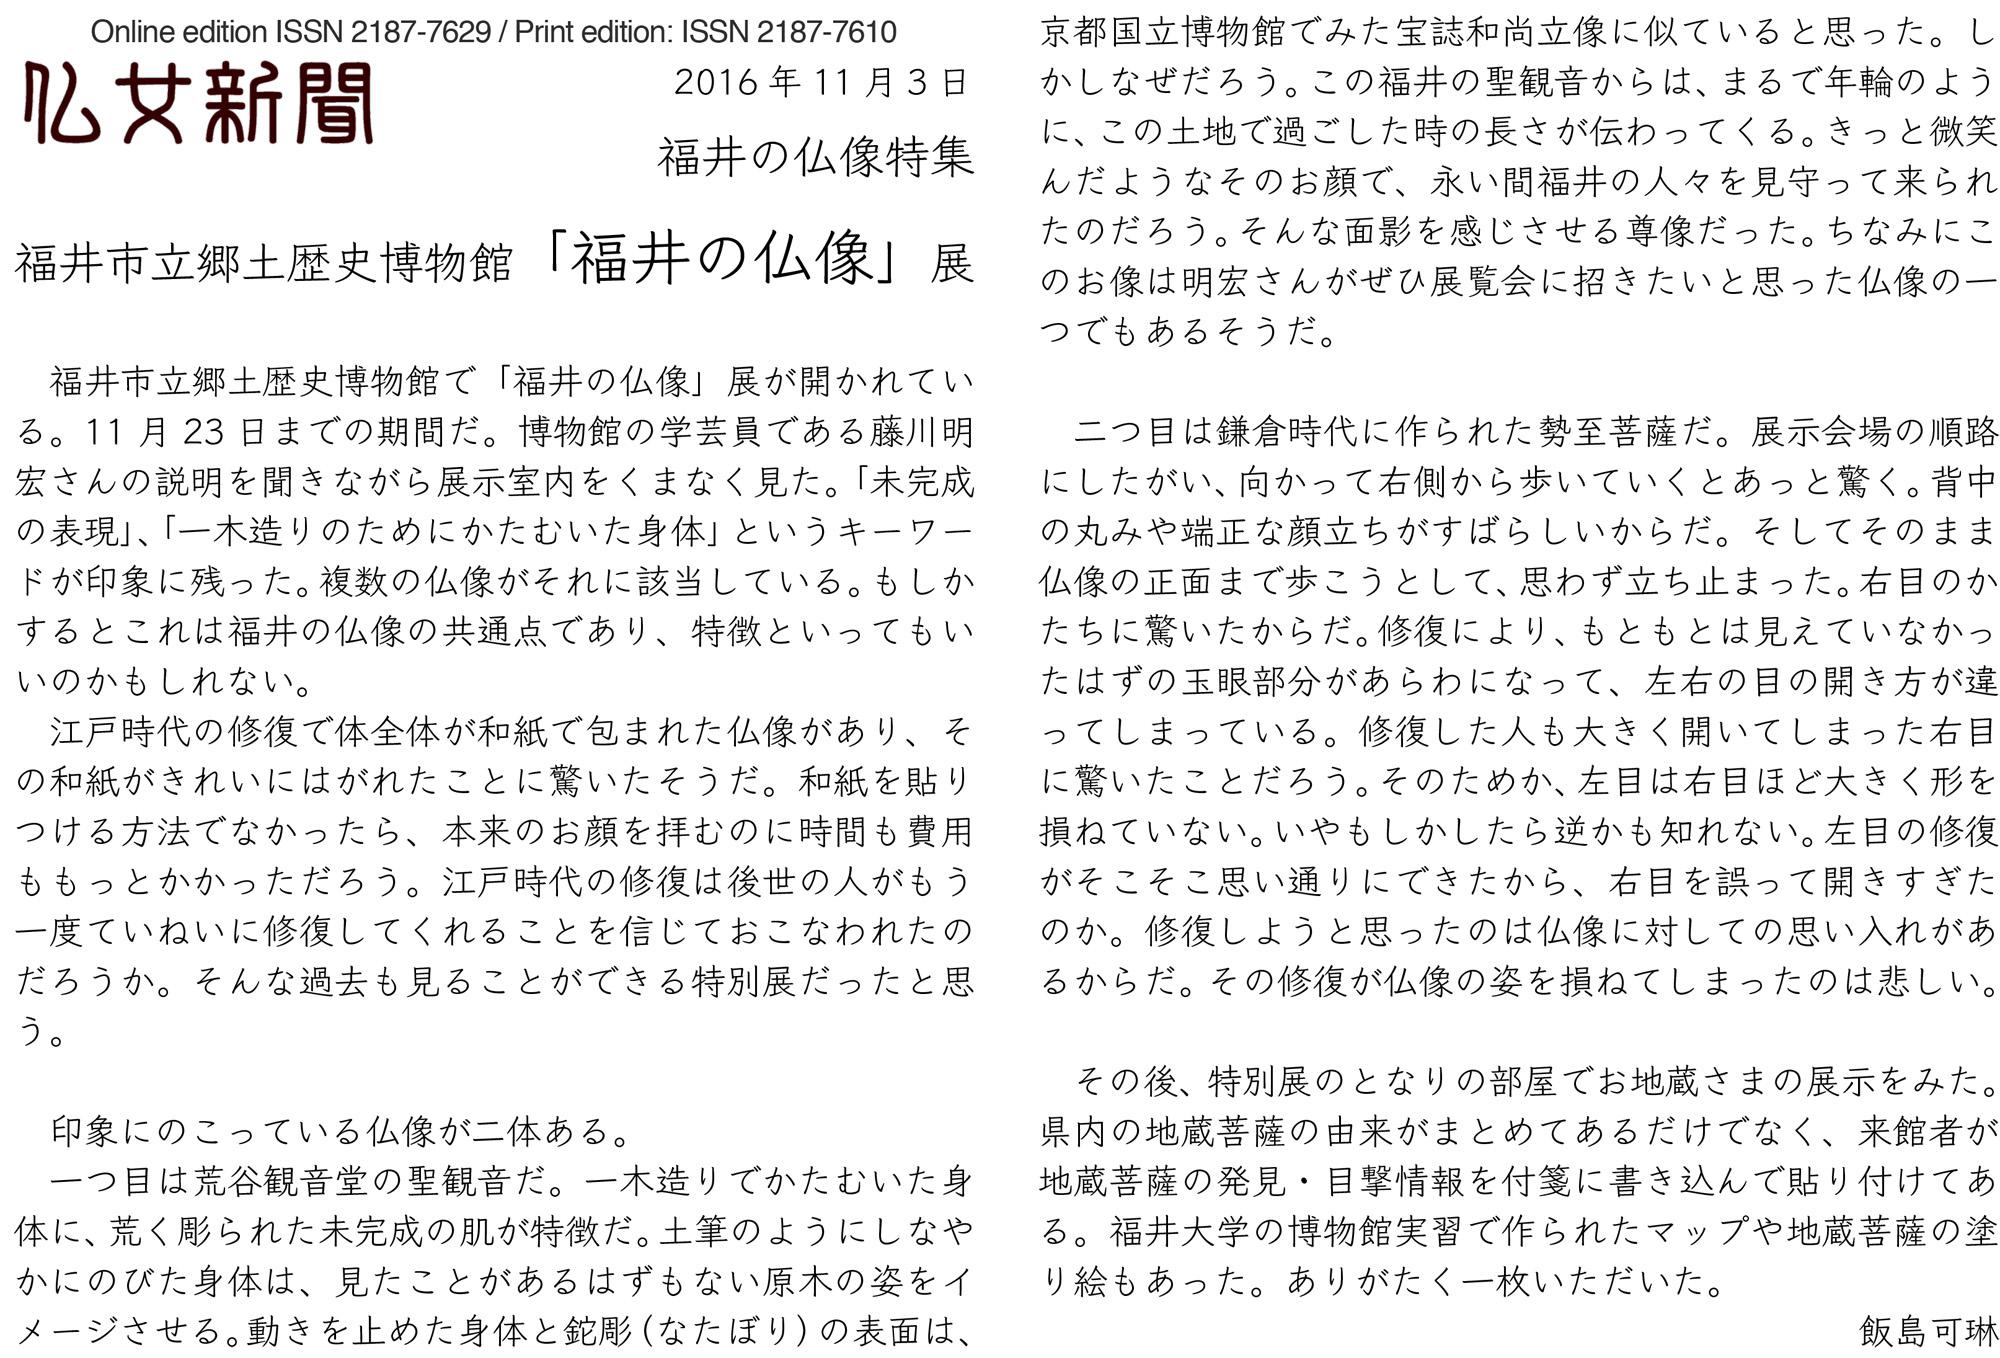 Microsoft Word - 訂正福井の仏像.docx